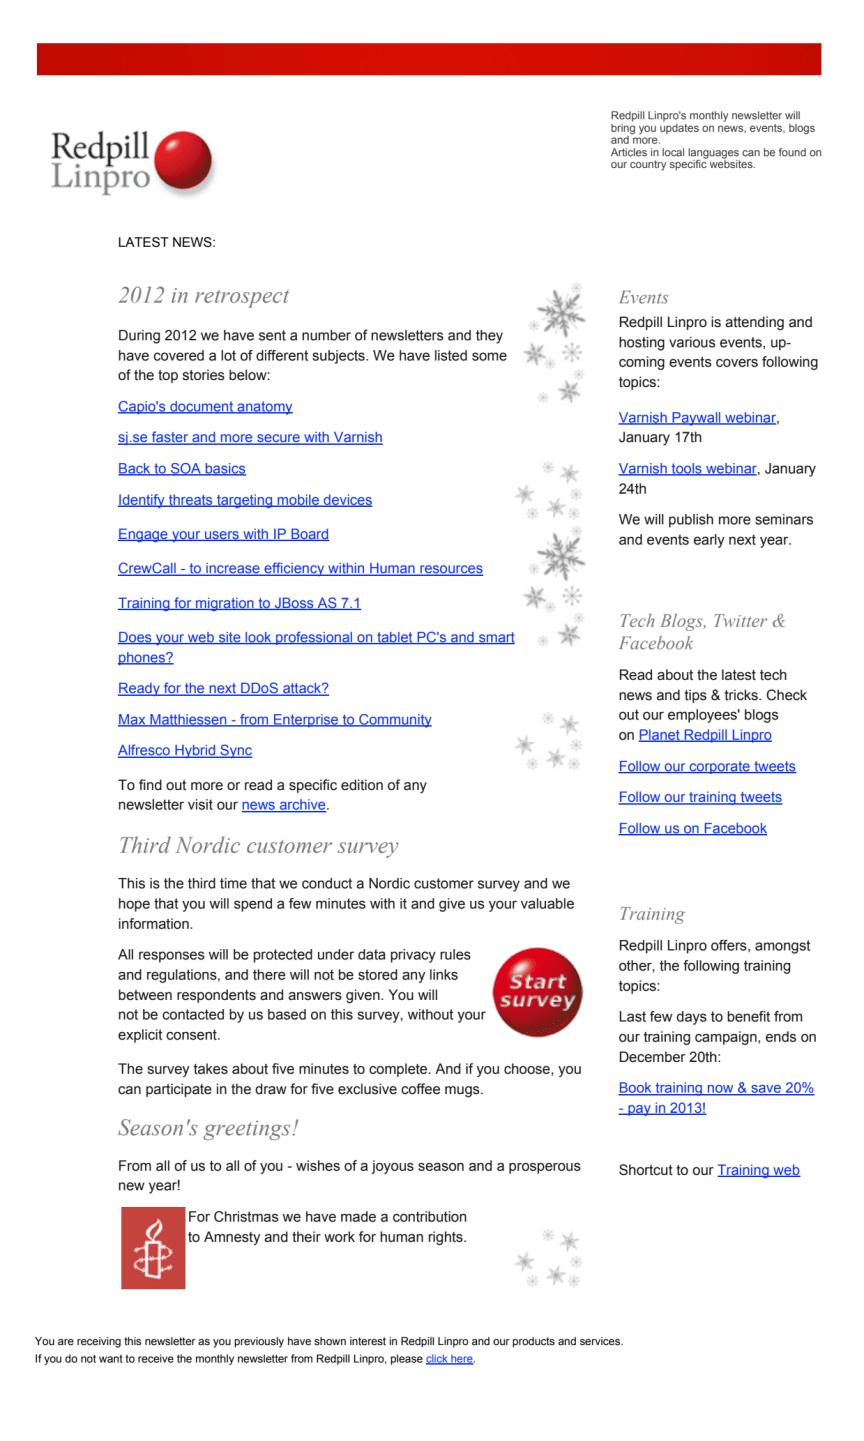 Redpill Linpro Newsletter December 2012